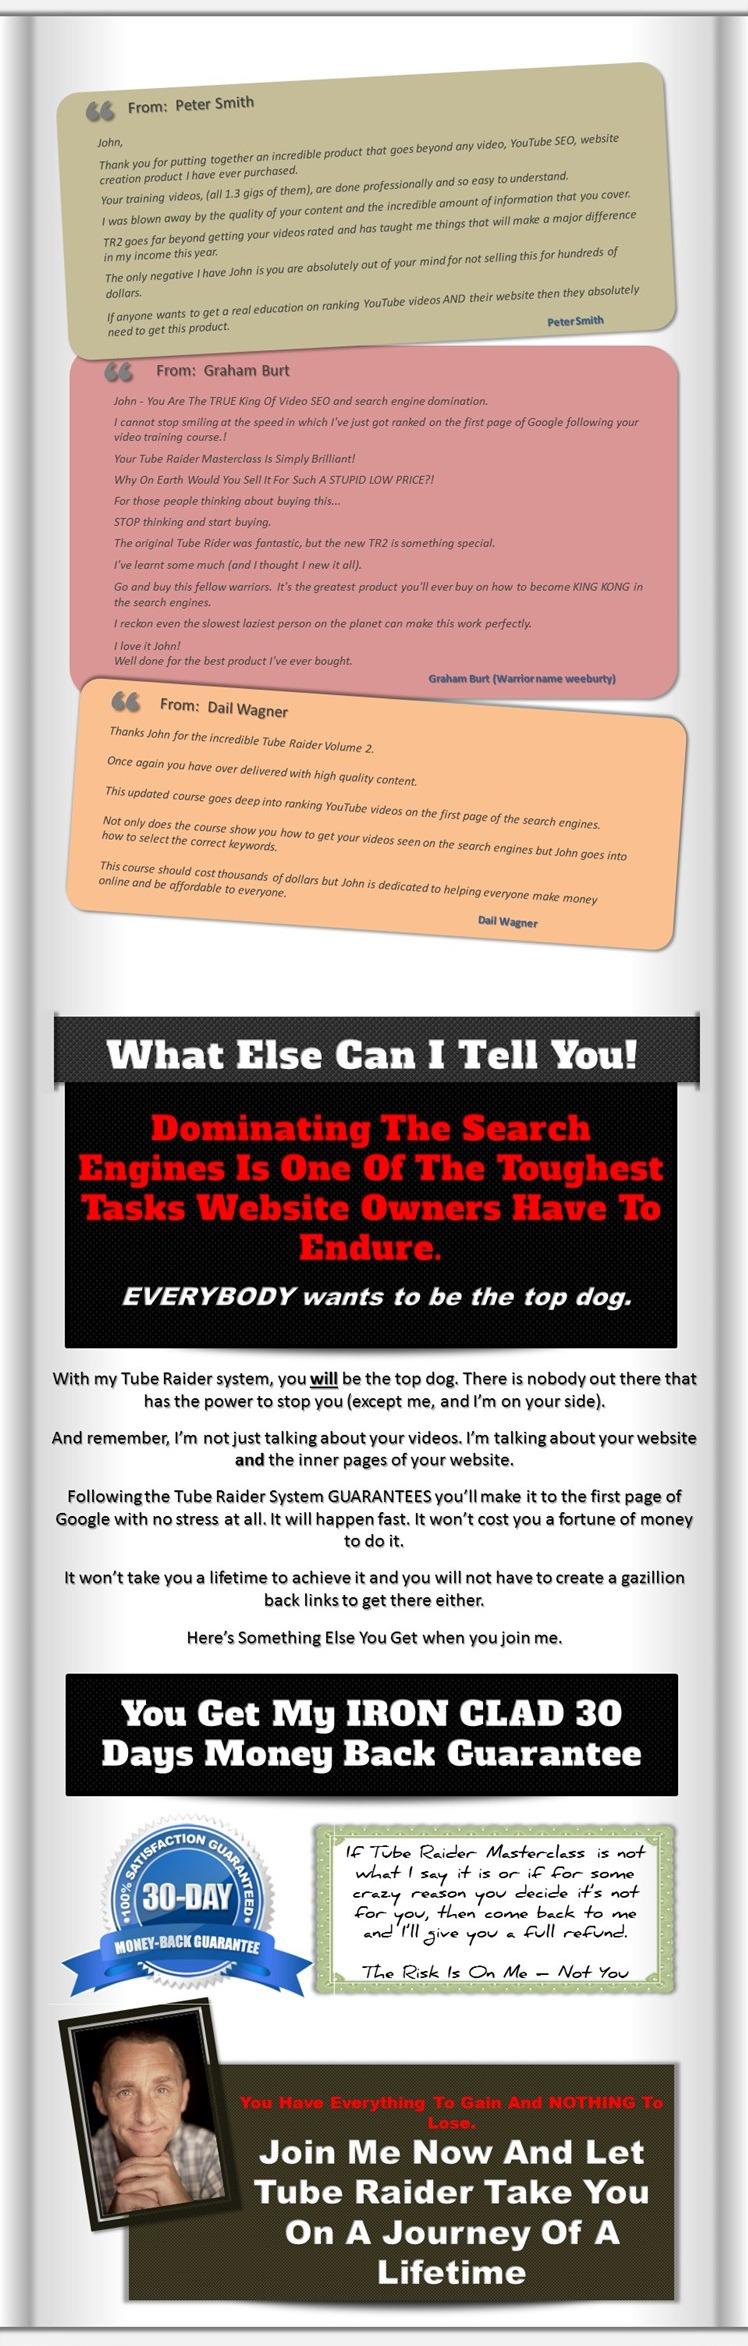 Tube Raider Masterclass4